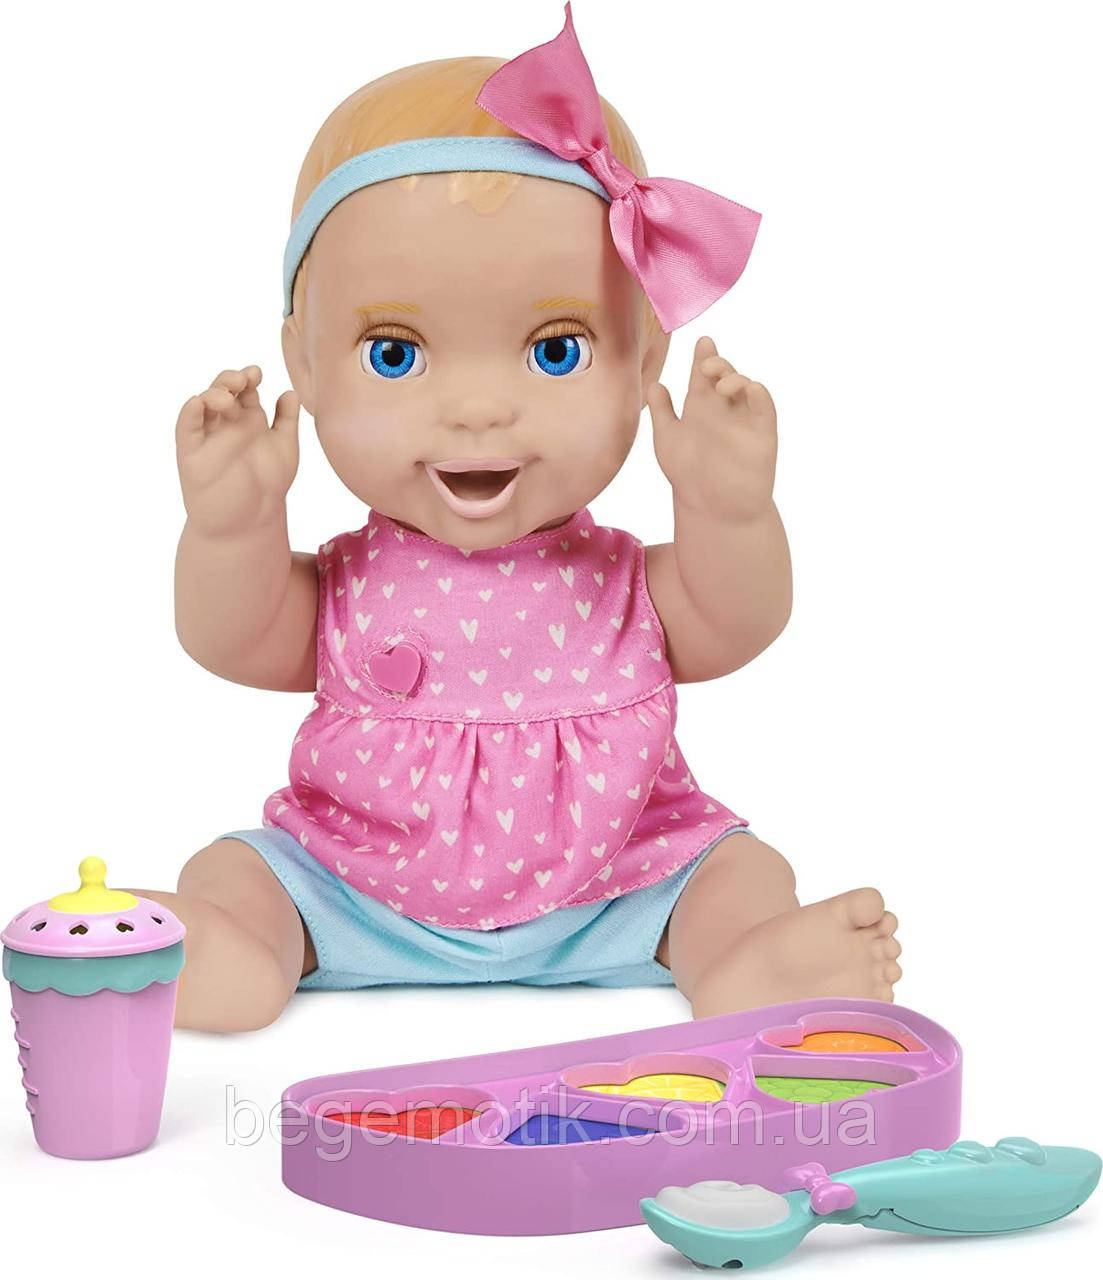 Интерактивная кукла Лувабелла Мия Блондинка Luvabella Mealtime Magic Mia оригинал от SpinMaster